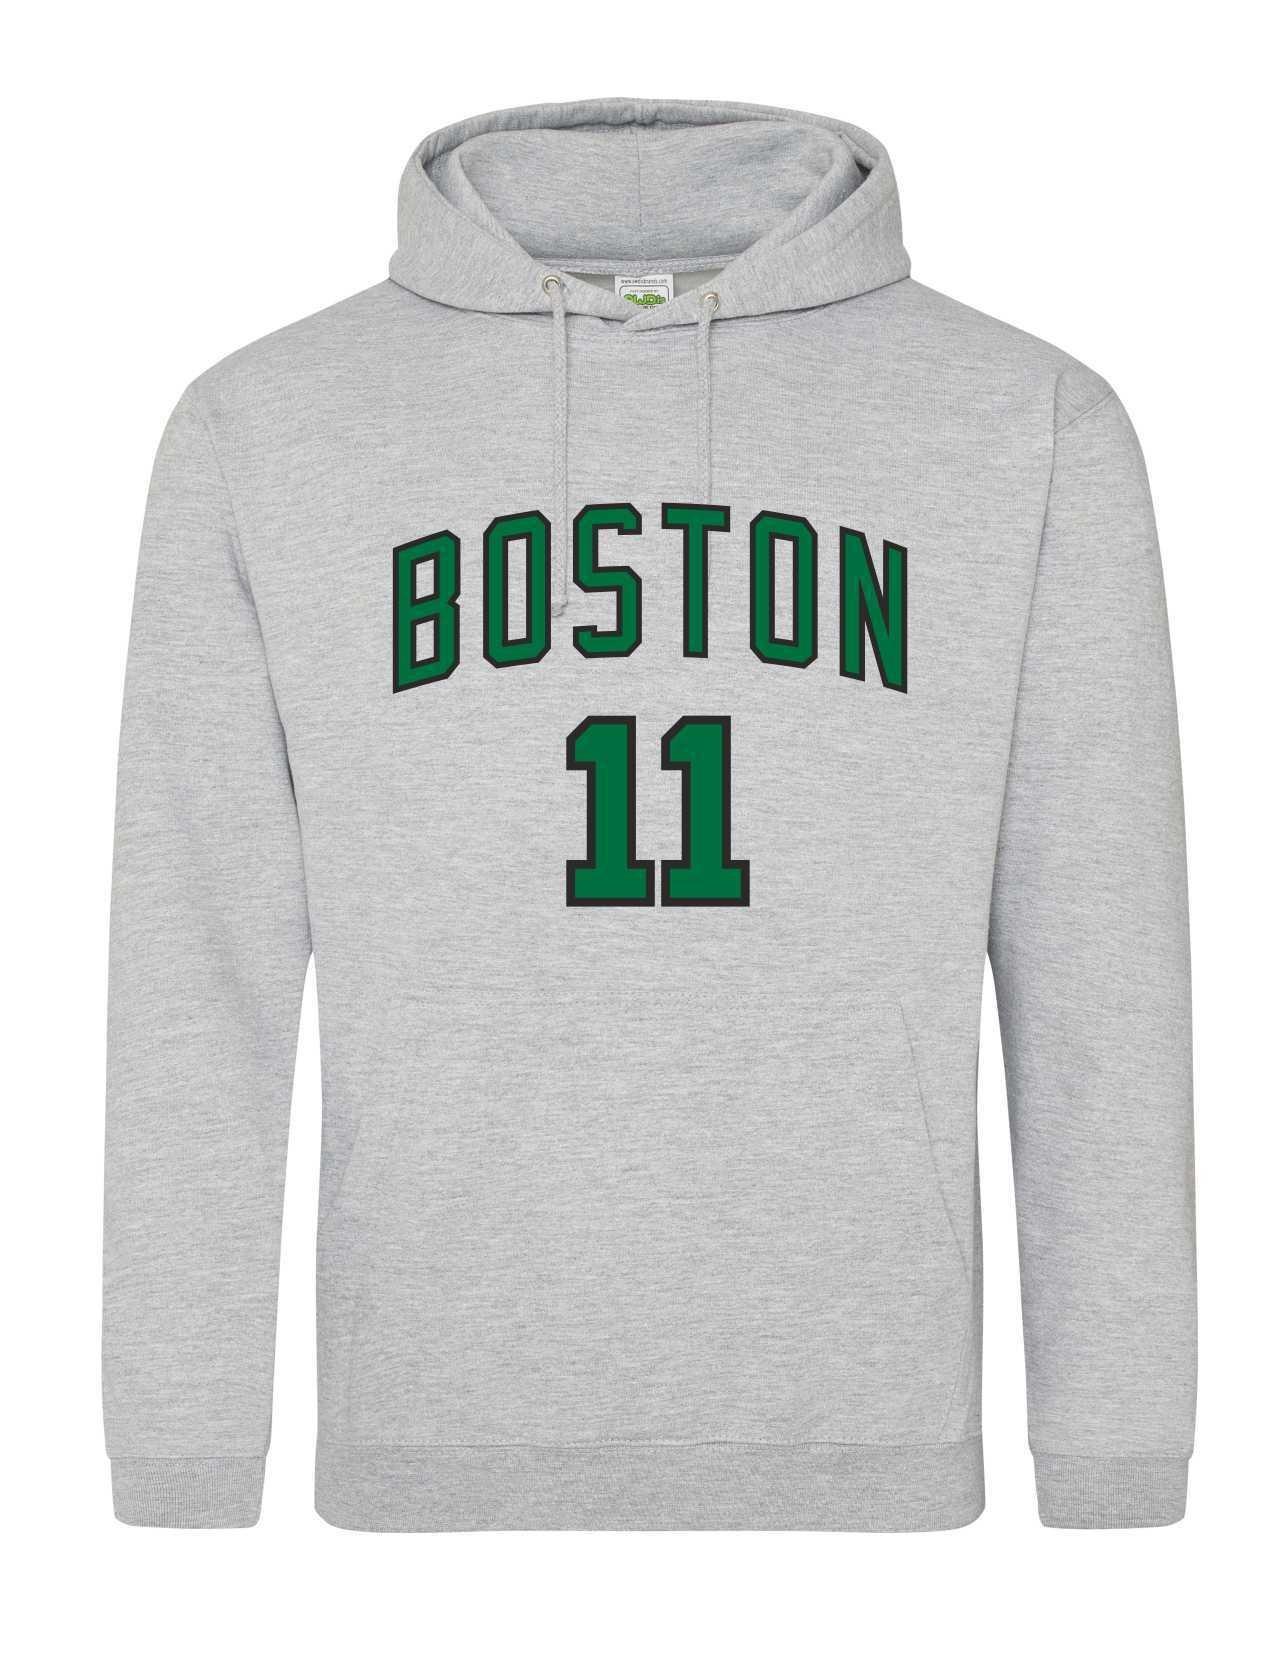 Boston 11 504